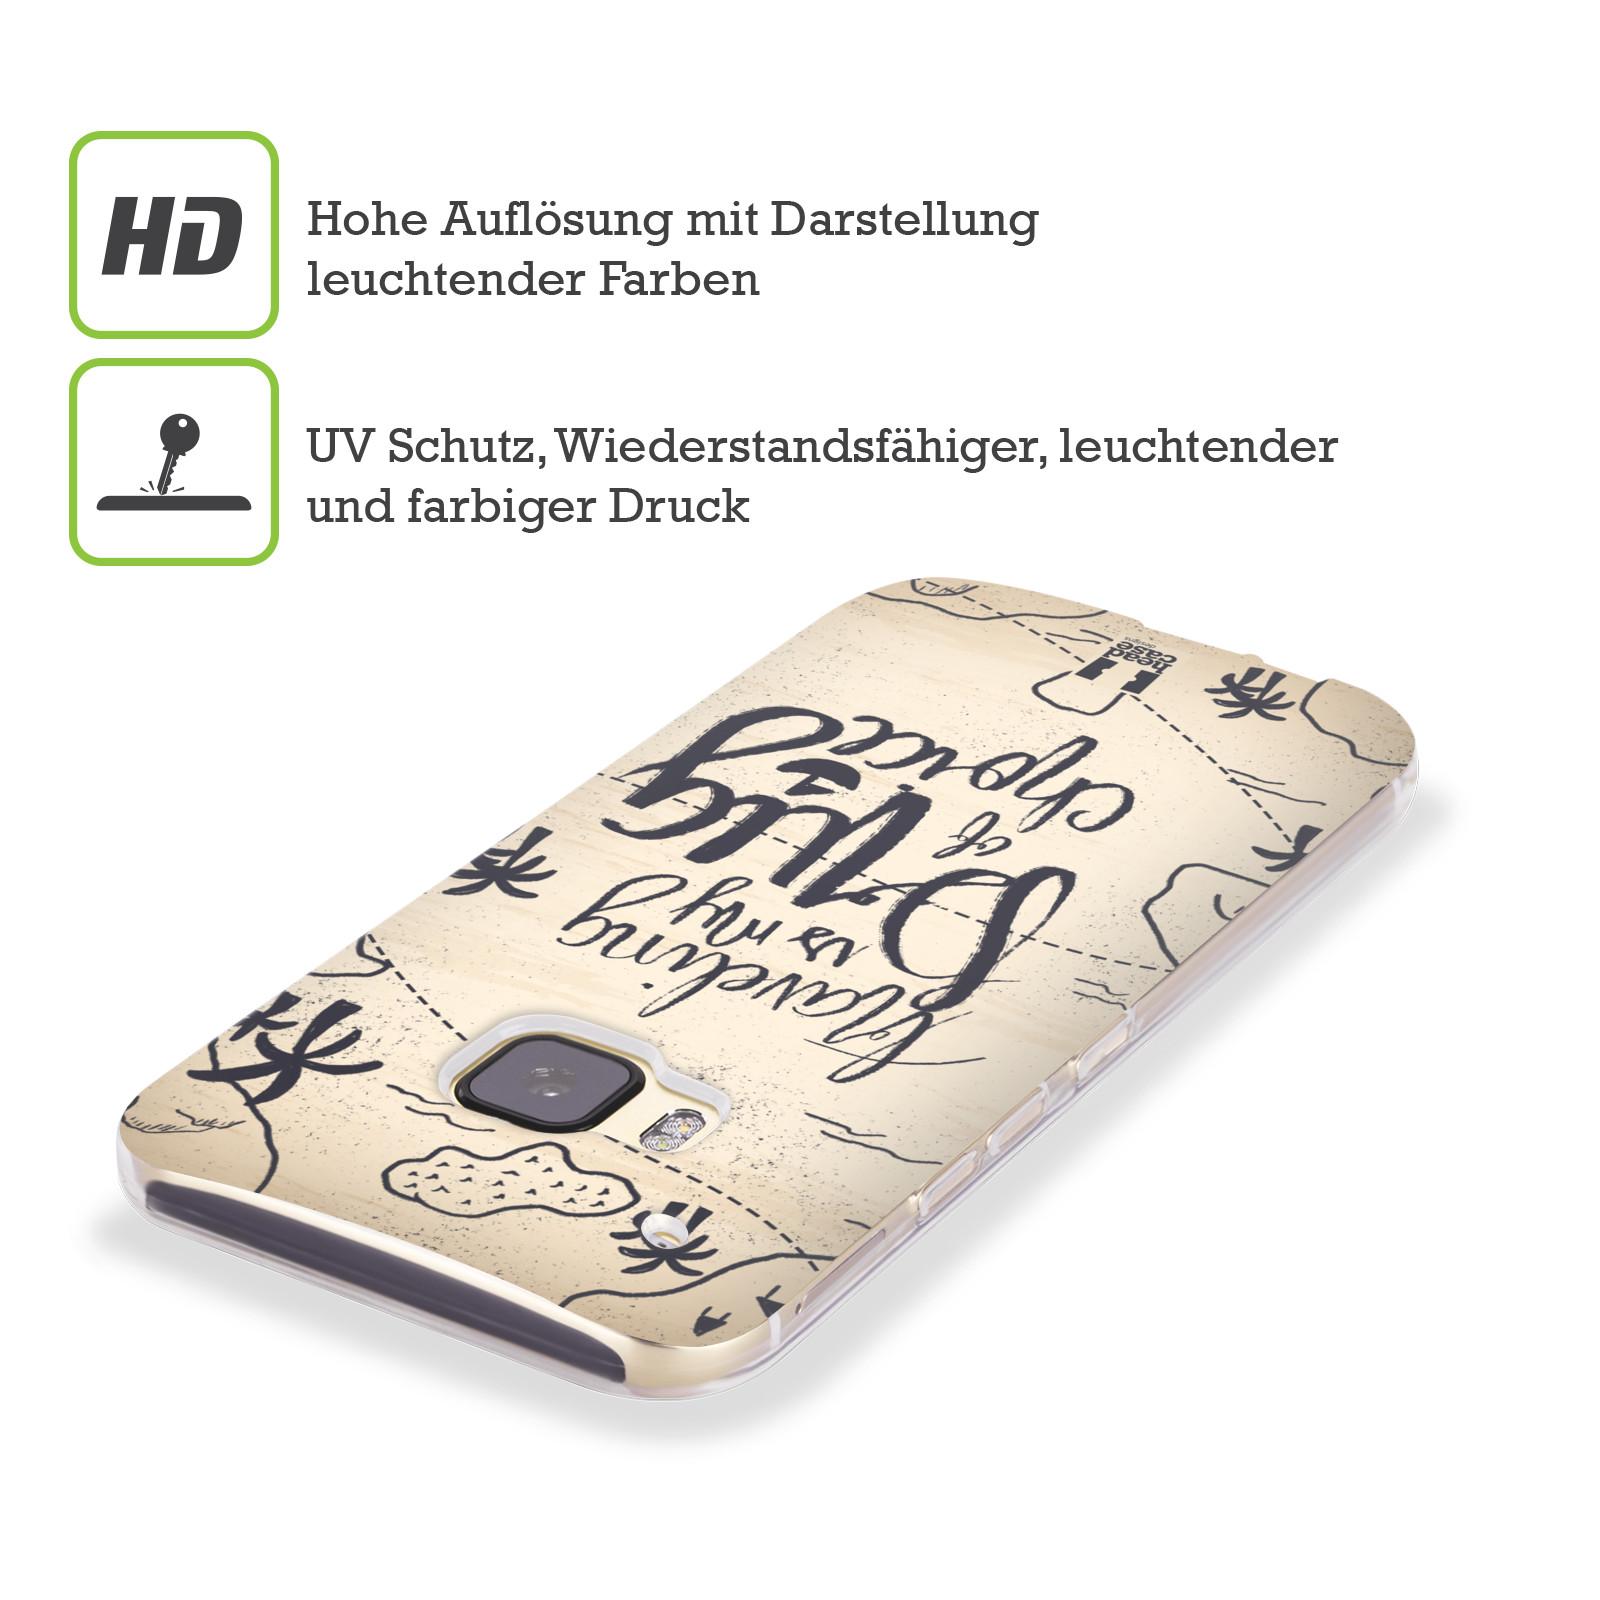 HEAD-CASE-DESIGNS-VINTAGE-REISETAGEBUCH-SOFT-GEL-HULLE-FUR-HTC-HANDYS-2